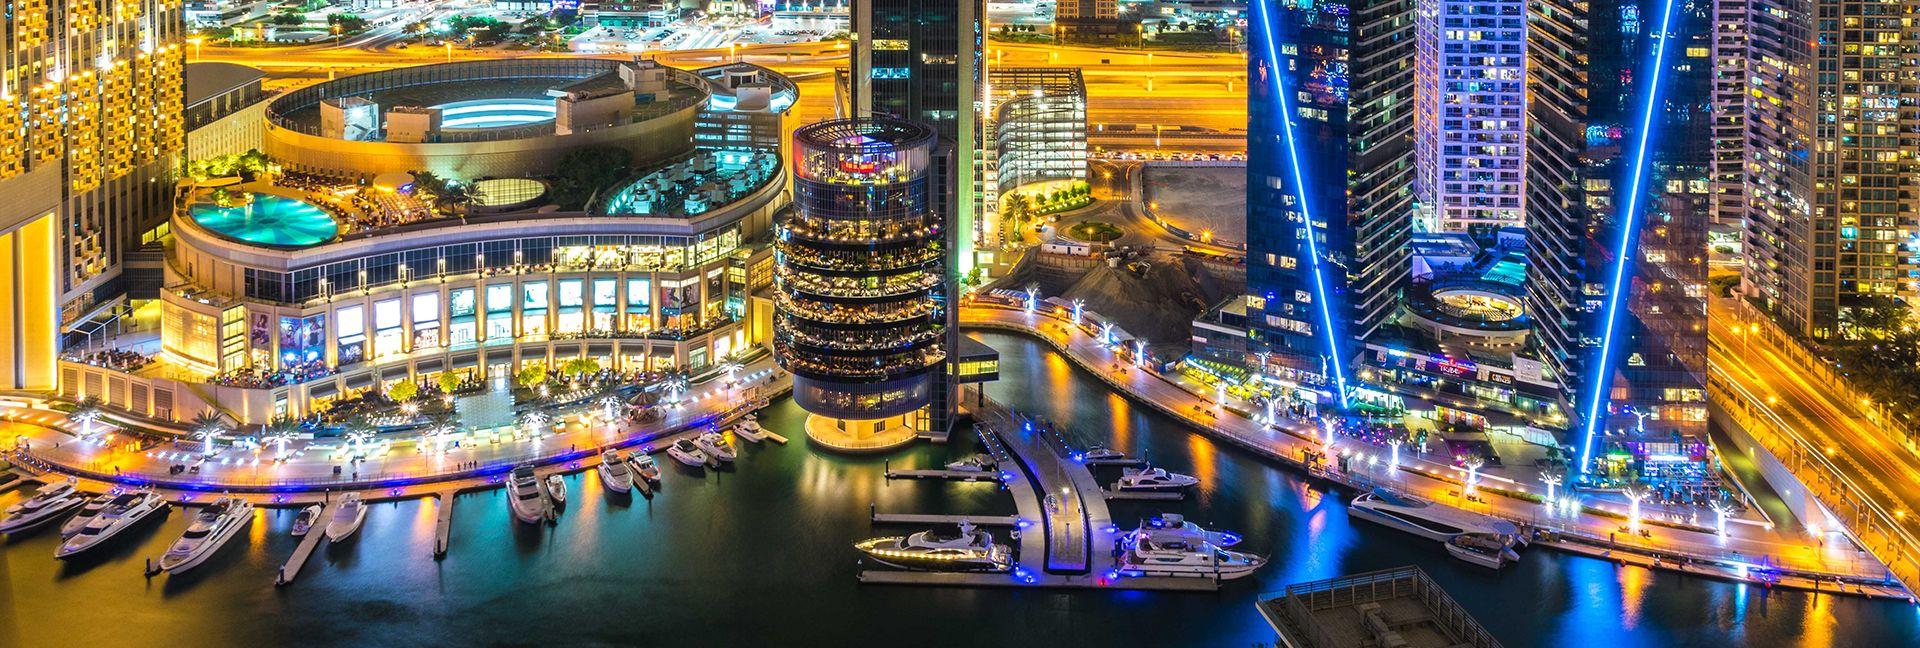 Dubai Marina Pier 7